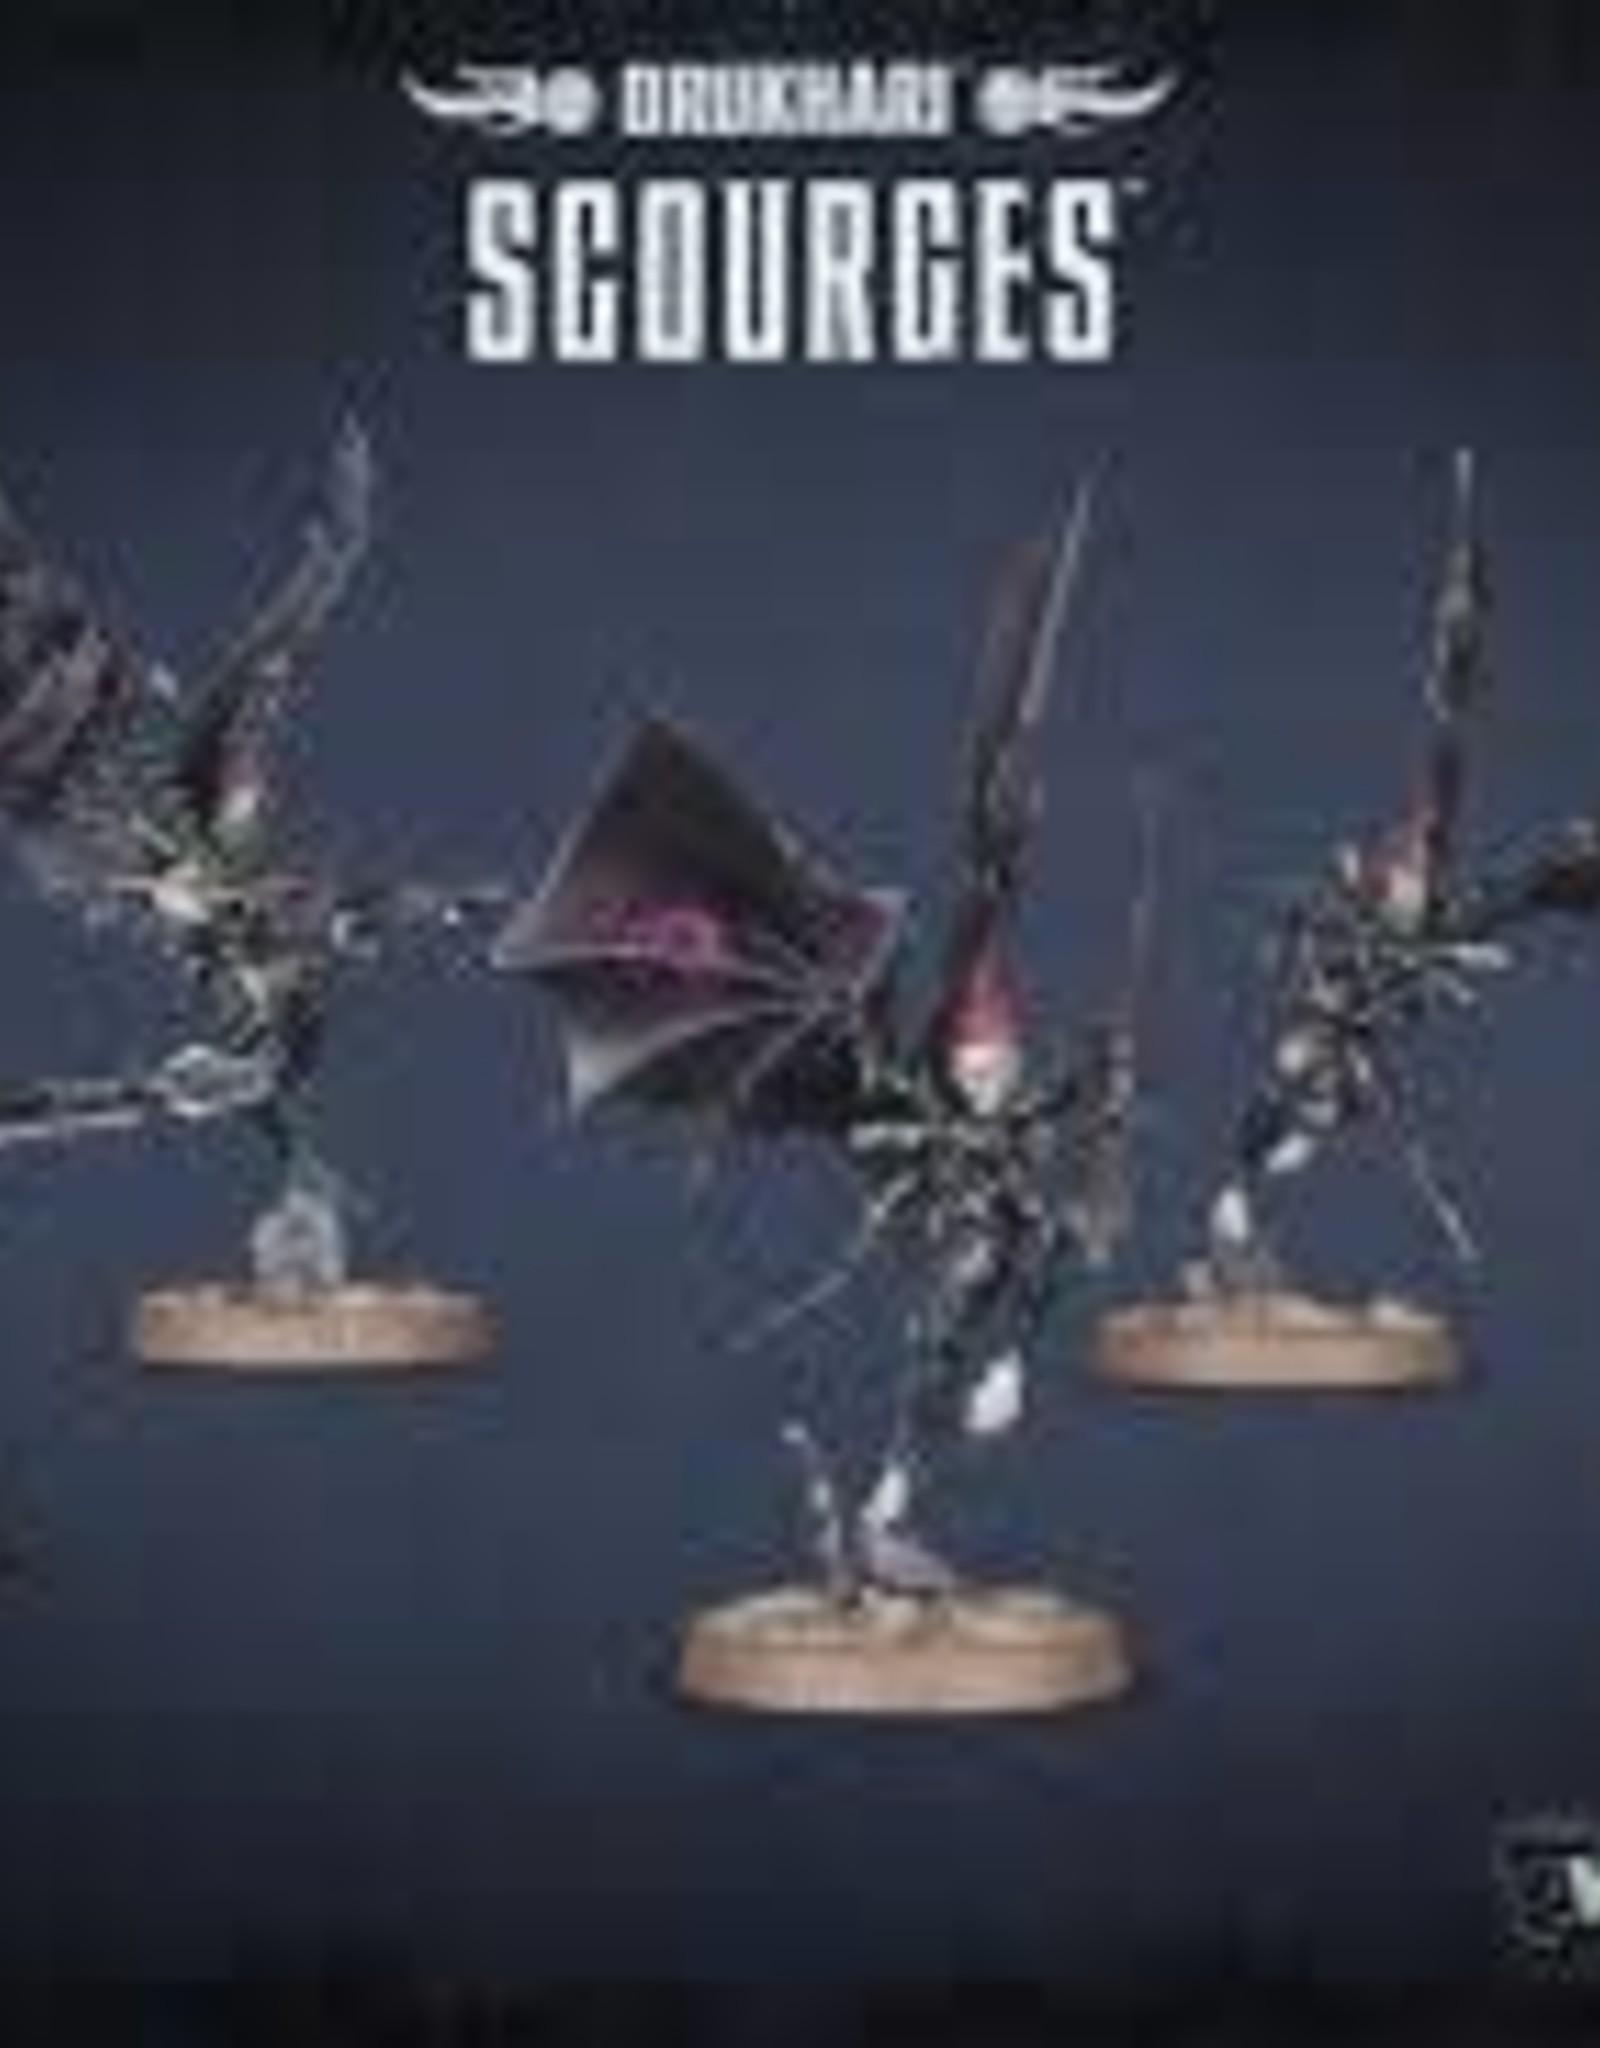 Games Workshop Drukhari Scourges